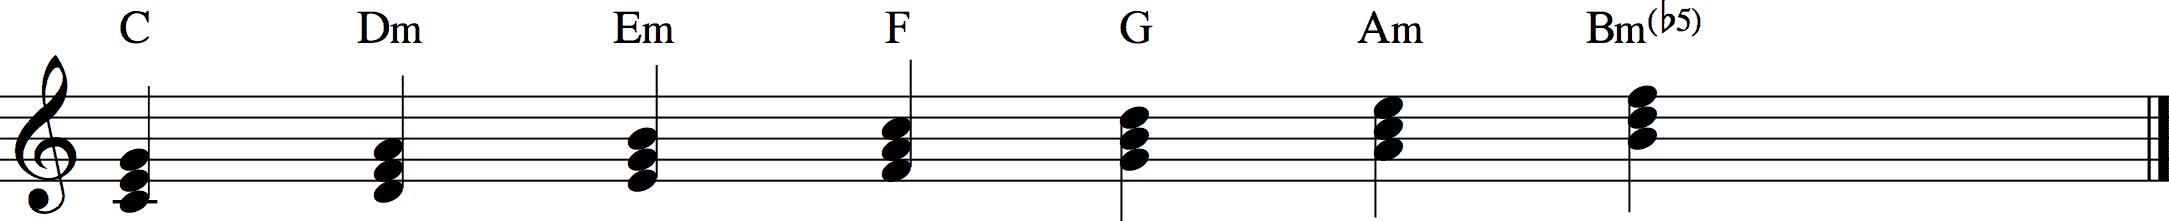 Chords C major tonality